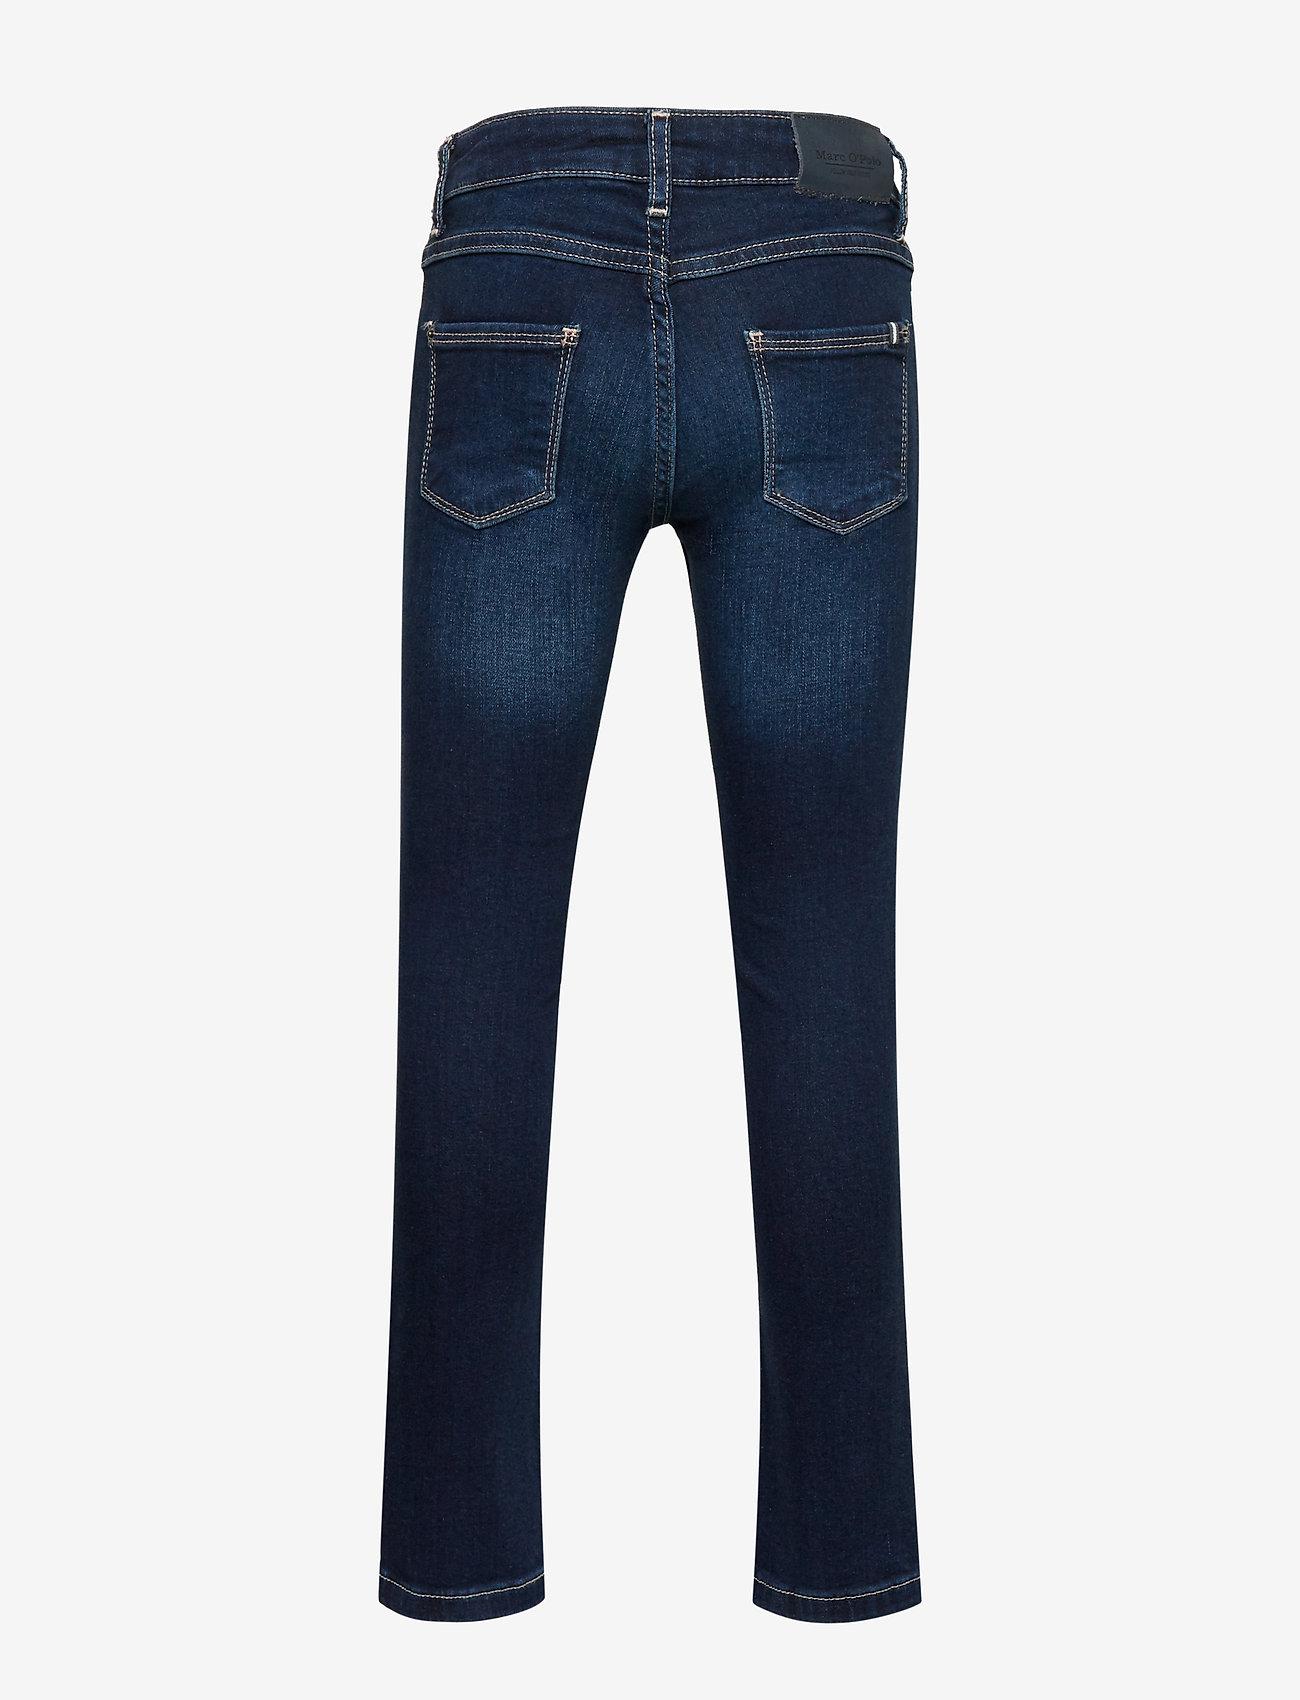 Denim Trousers (Blue Denim-blue) (59.95 €) - Marc O'Polo Junior 0mmor